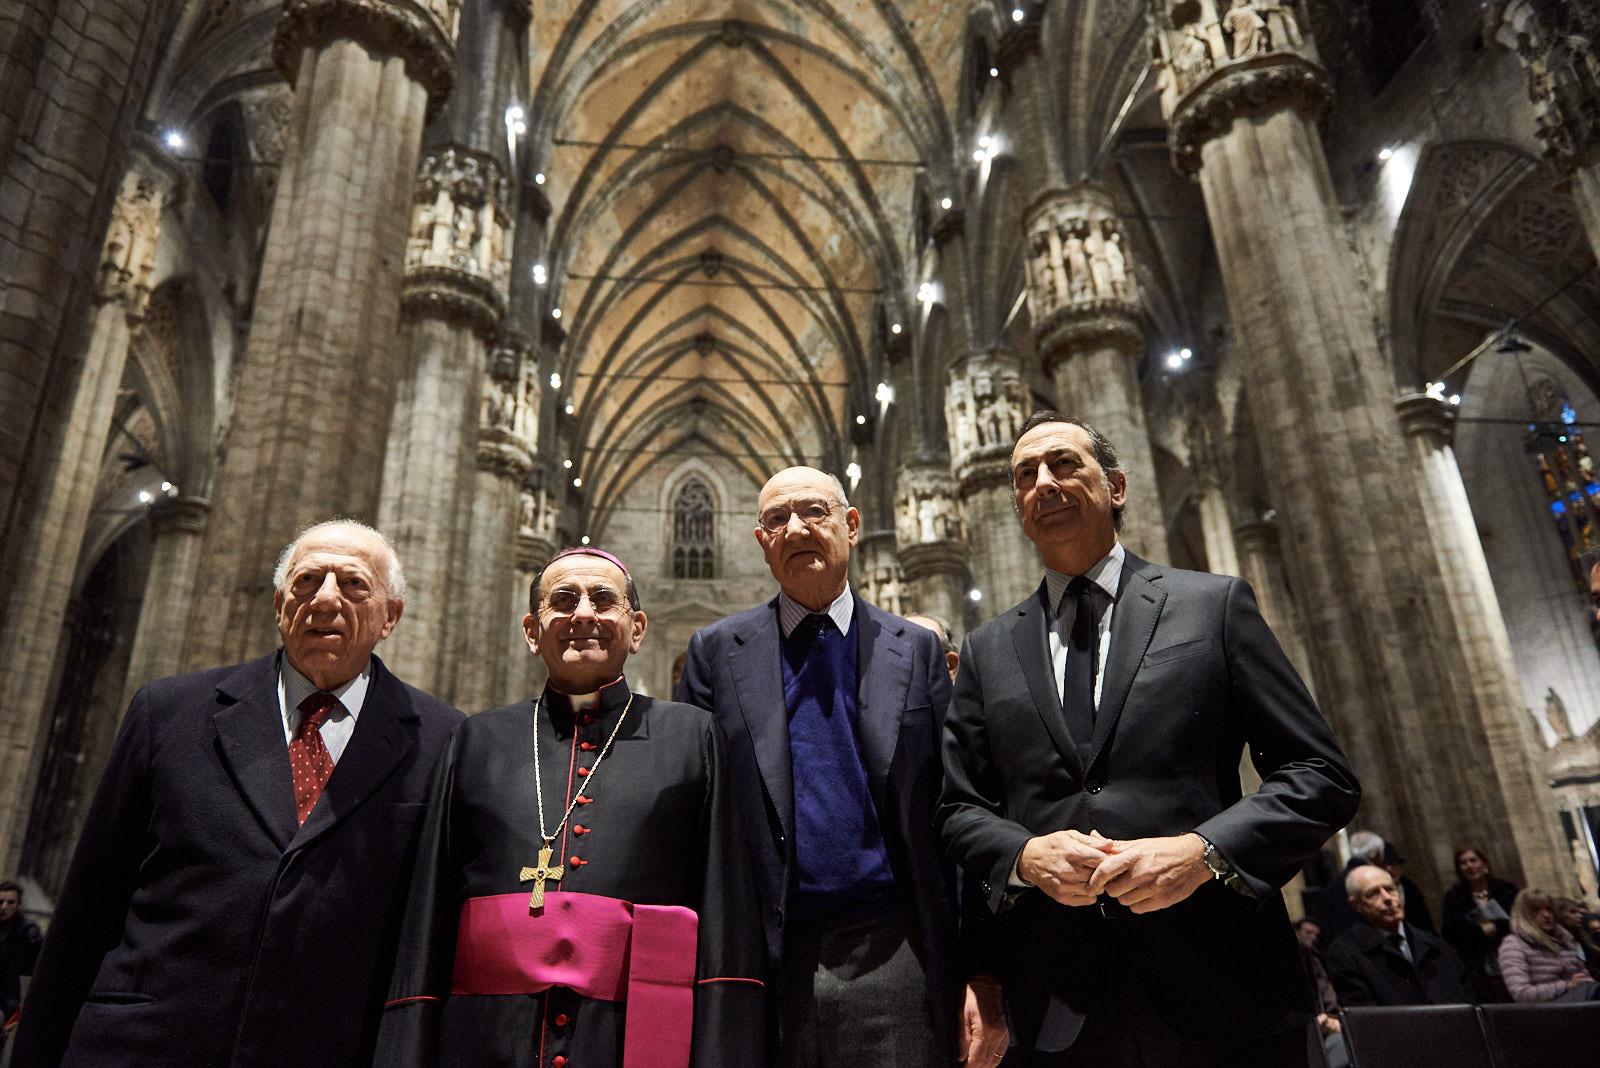 Fedele Confalonieri, Mons. Mario Delpini, Gabriele Nissim and Giuseppe Sala